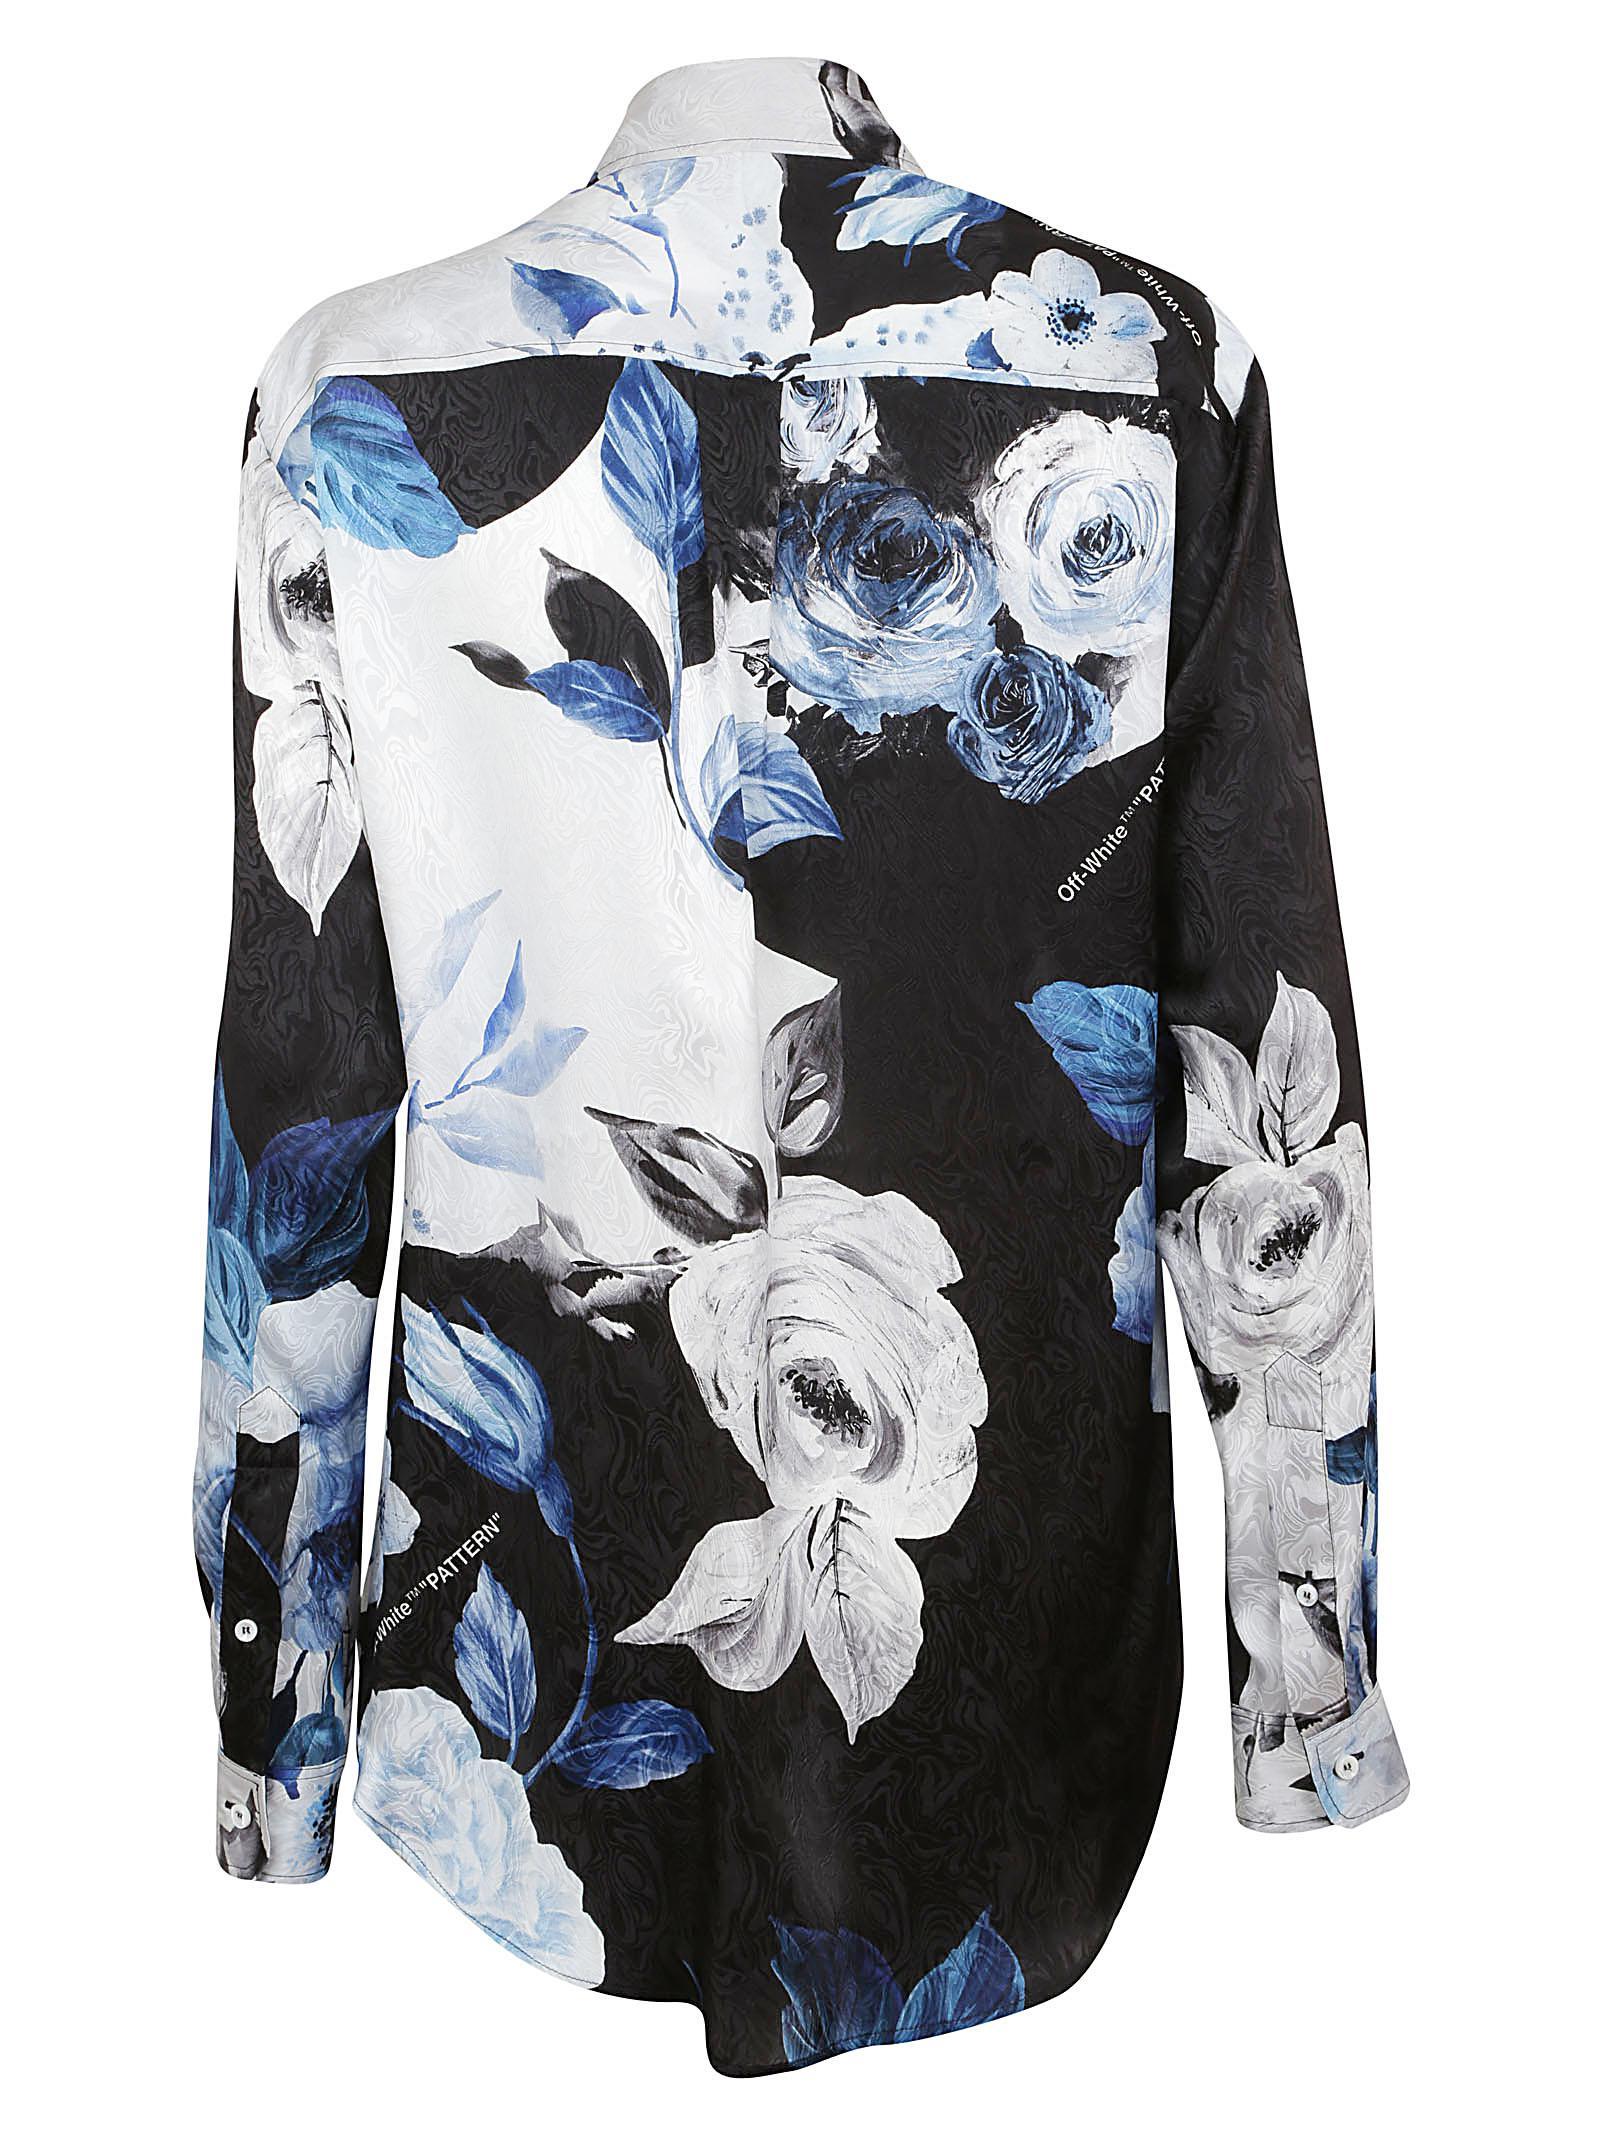 9a27fcf516a7 Lyst - Off-White c o Virgil Abloh Floral Basic Shirt in Black